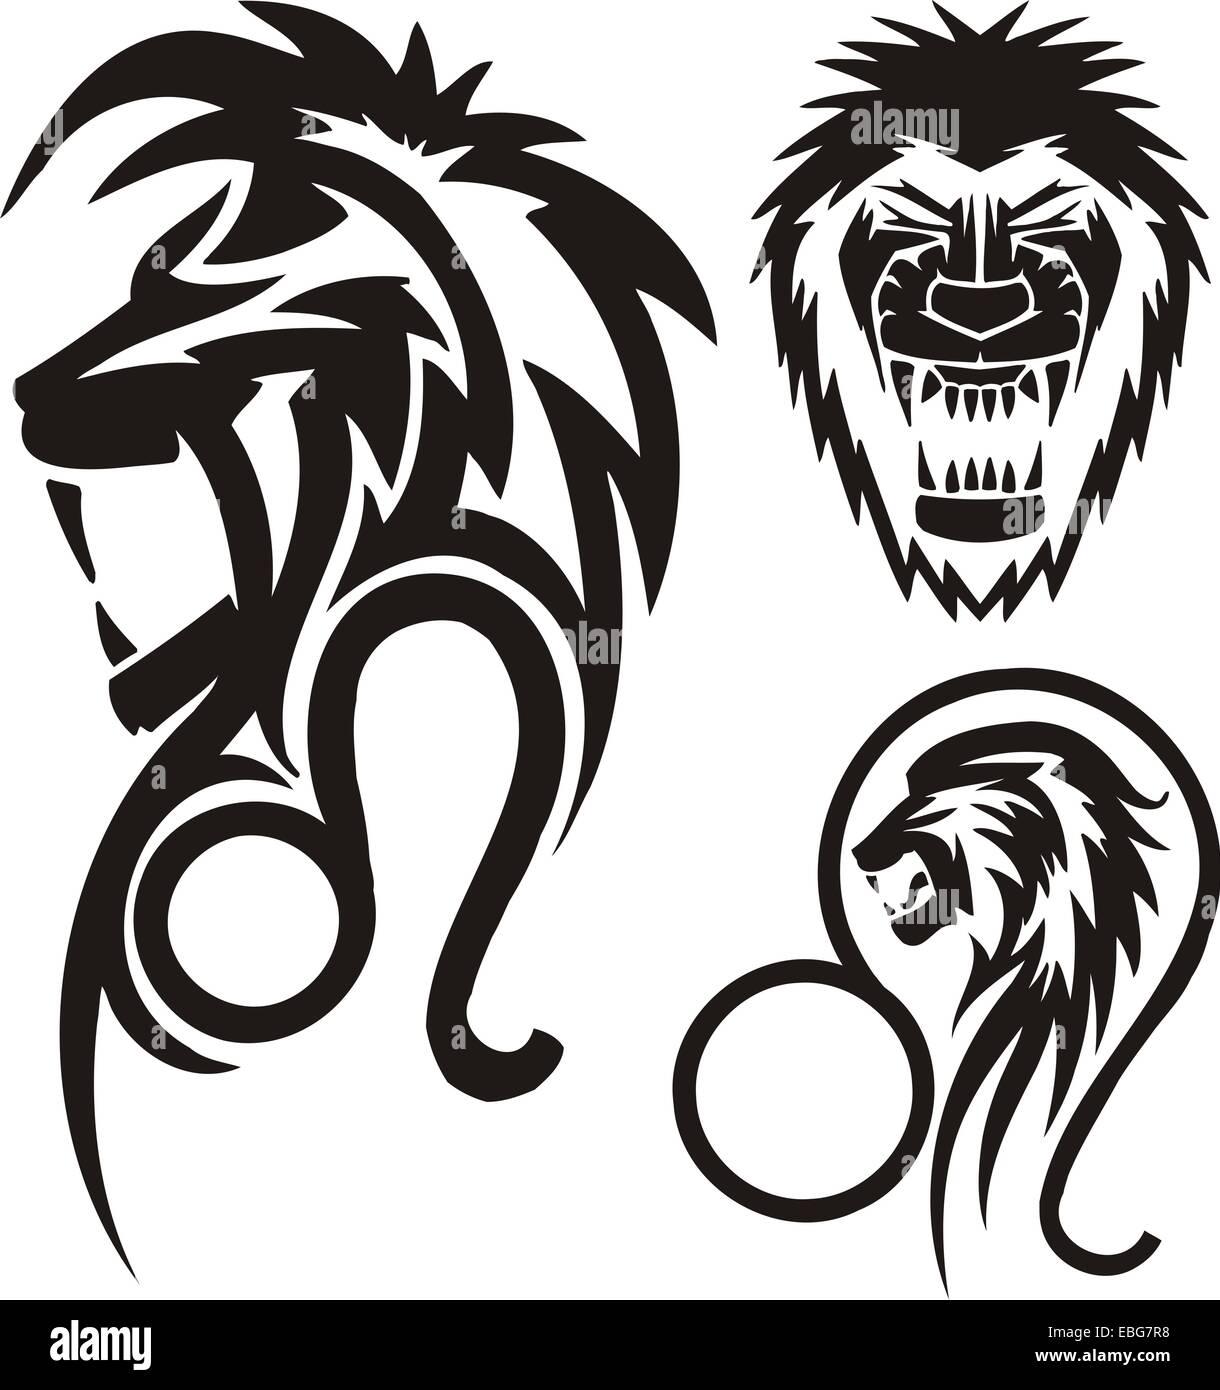 Zodiac Signs - lion. Vinyl-ready vector set. - Stock Image